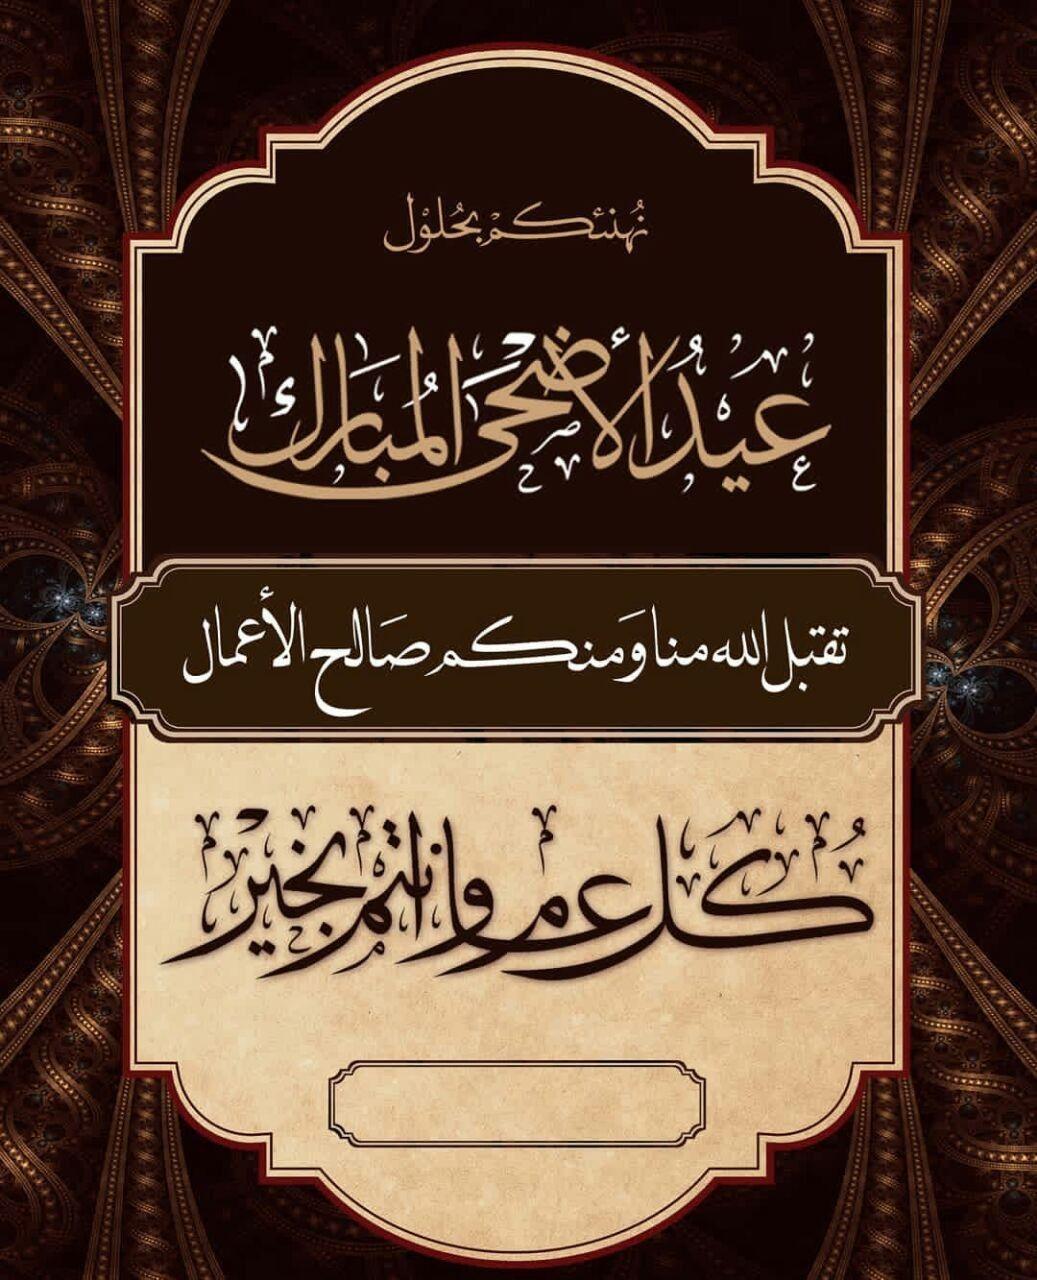 Pin By Anakhanfari On أعياد إسلامية Eid Photos Eid Quotes Eid Mubarak Greeting Cards